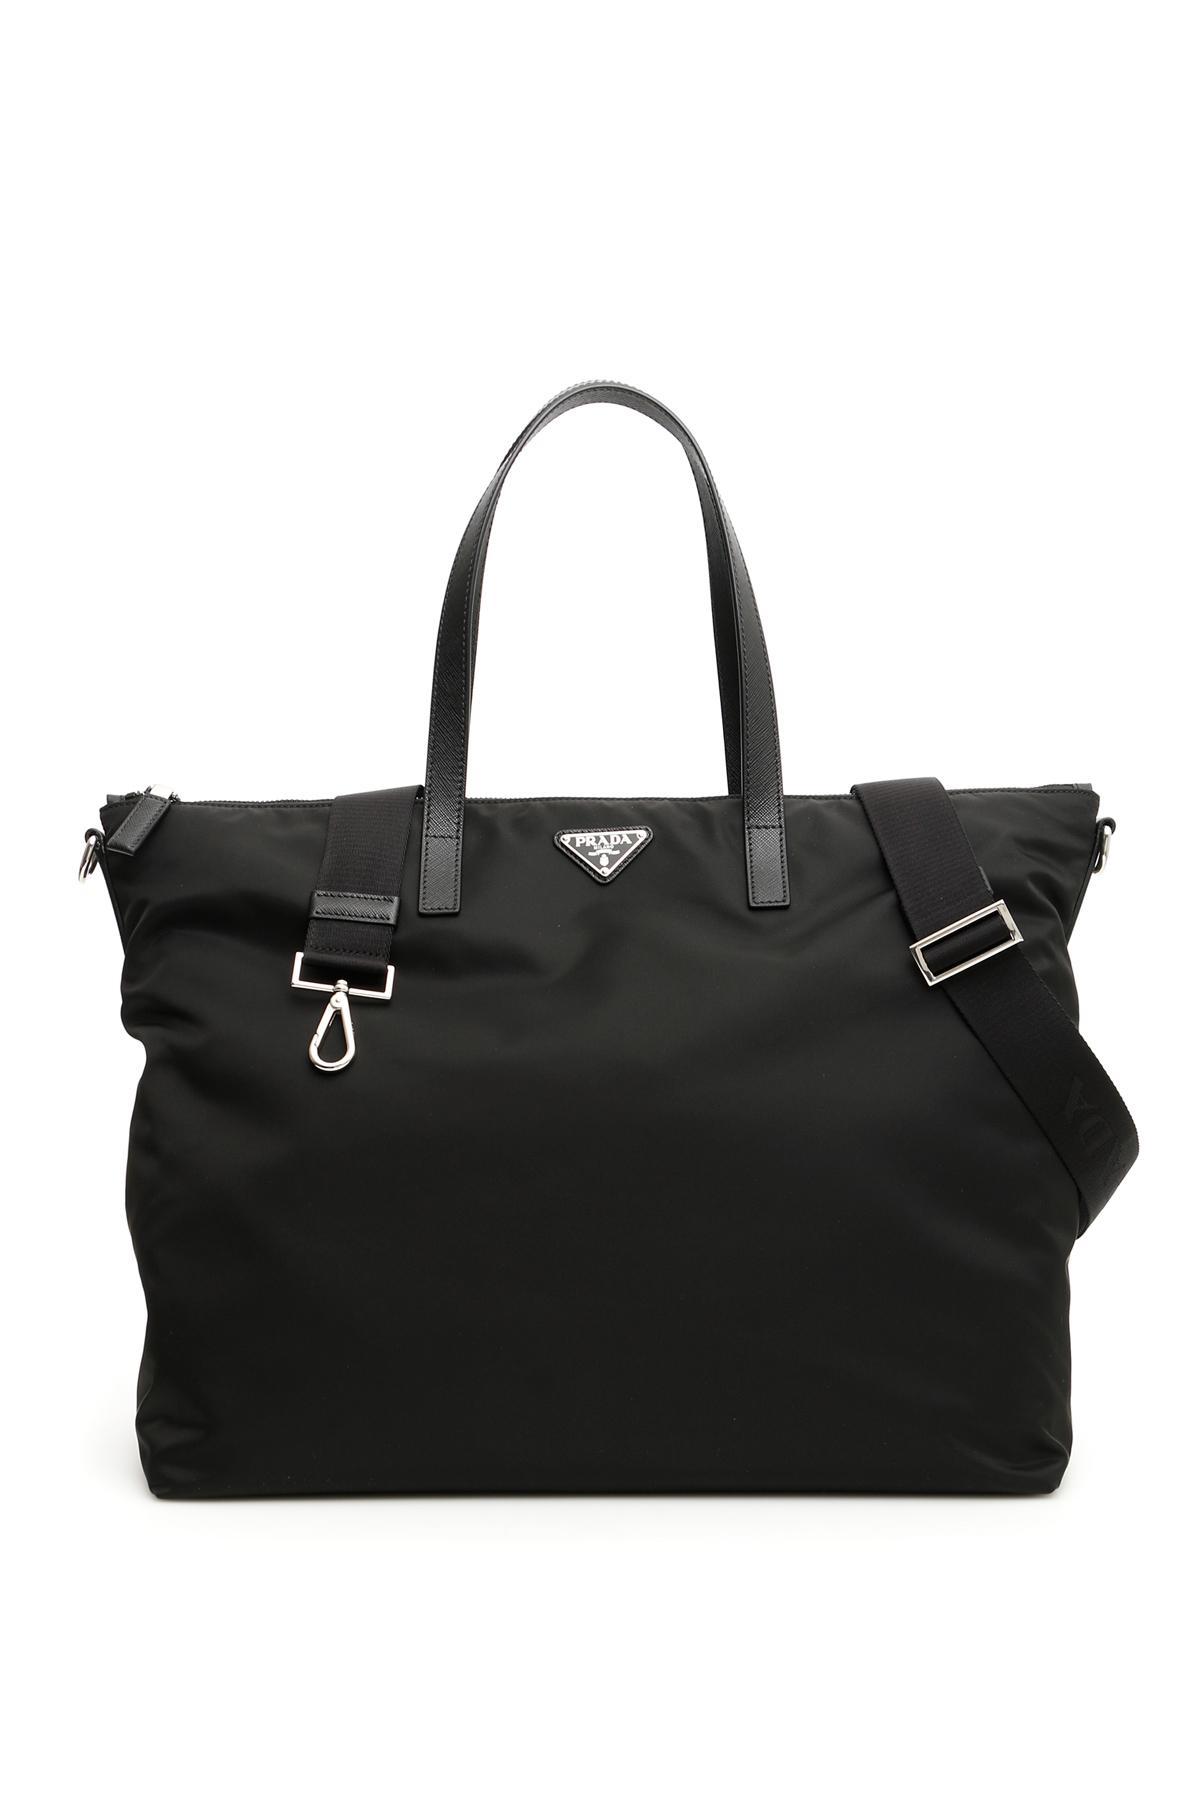 1ebad70be3 PRADA Philippines: PRADA price list - Bags, Perfume & Sunglasses for sale |  Lazada